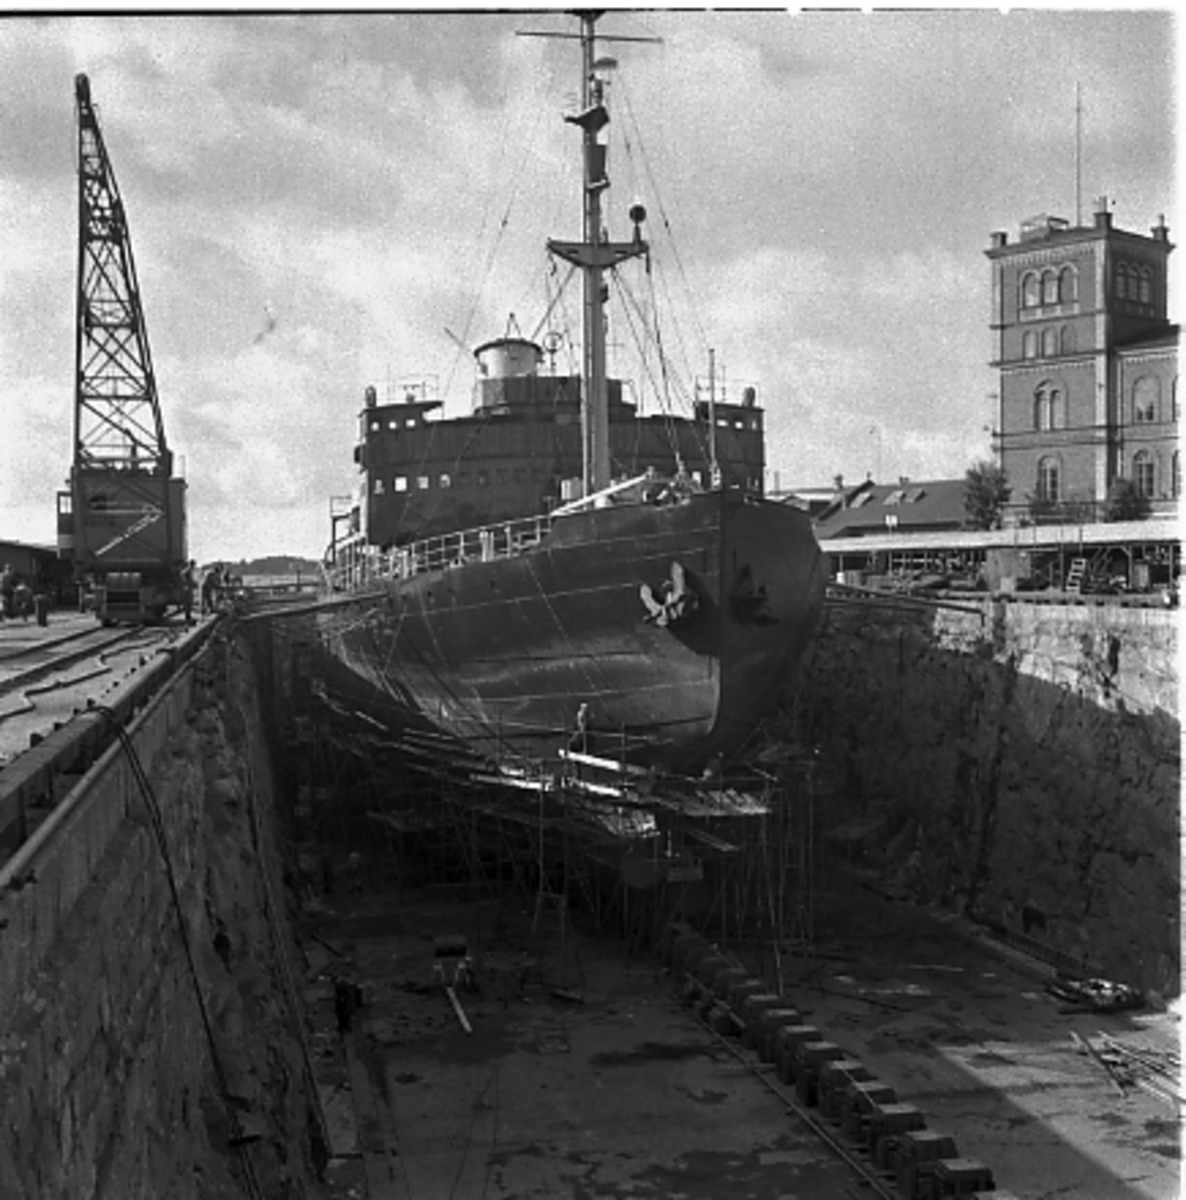 Fartyg: YMER                            Övrigt: Isbrytaren Ymer i Oscarsdockan